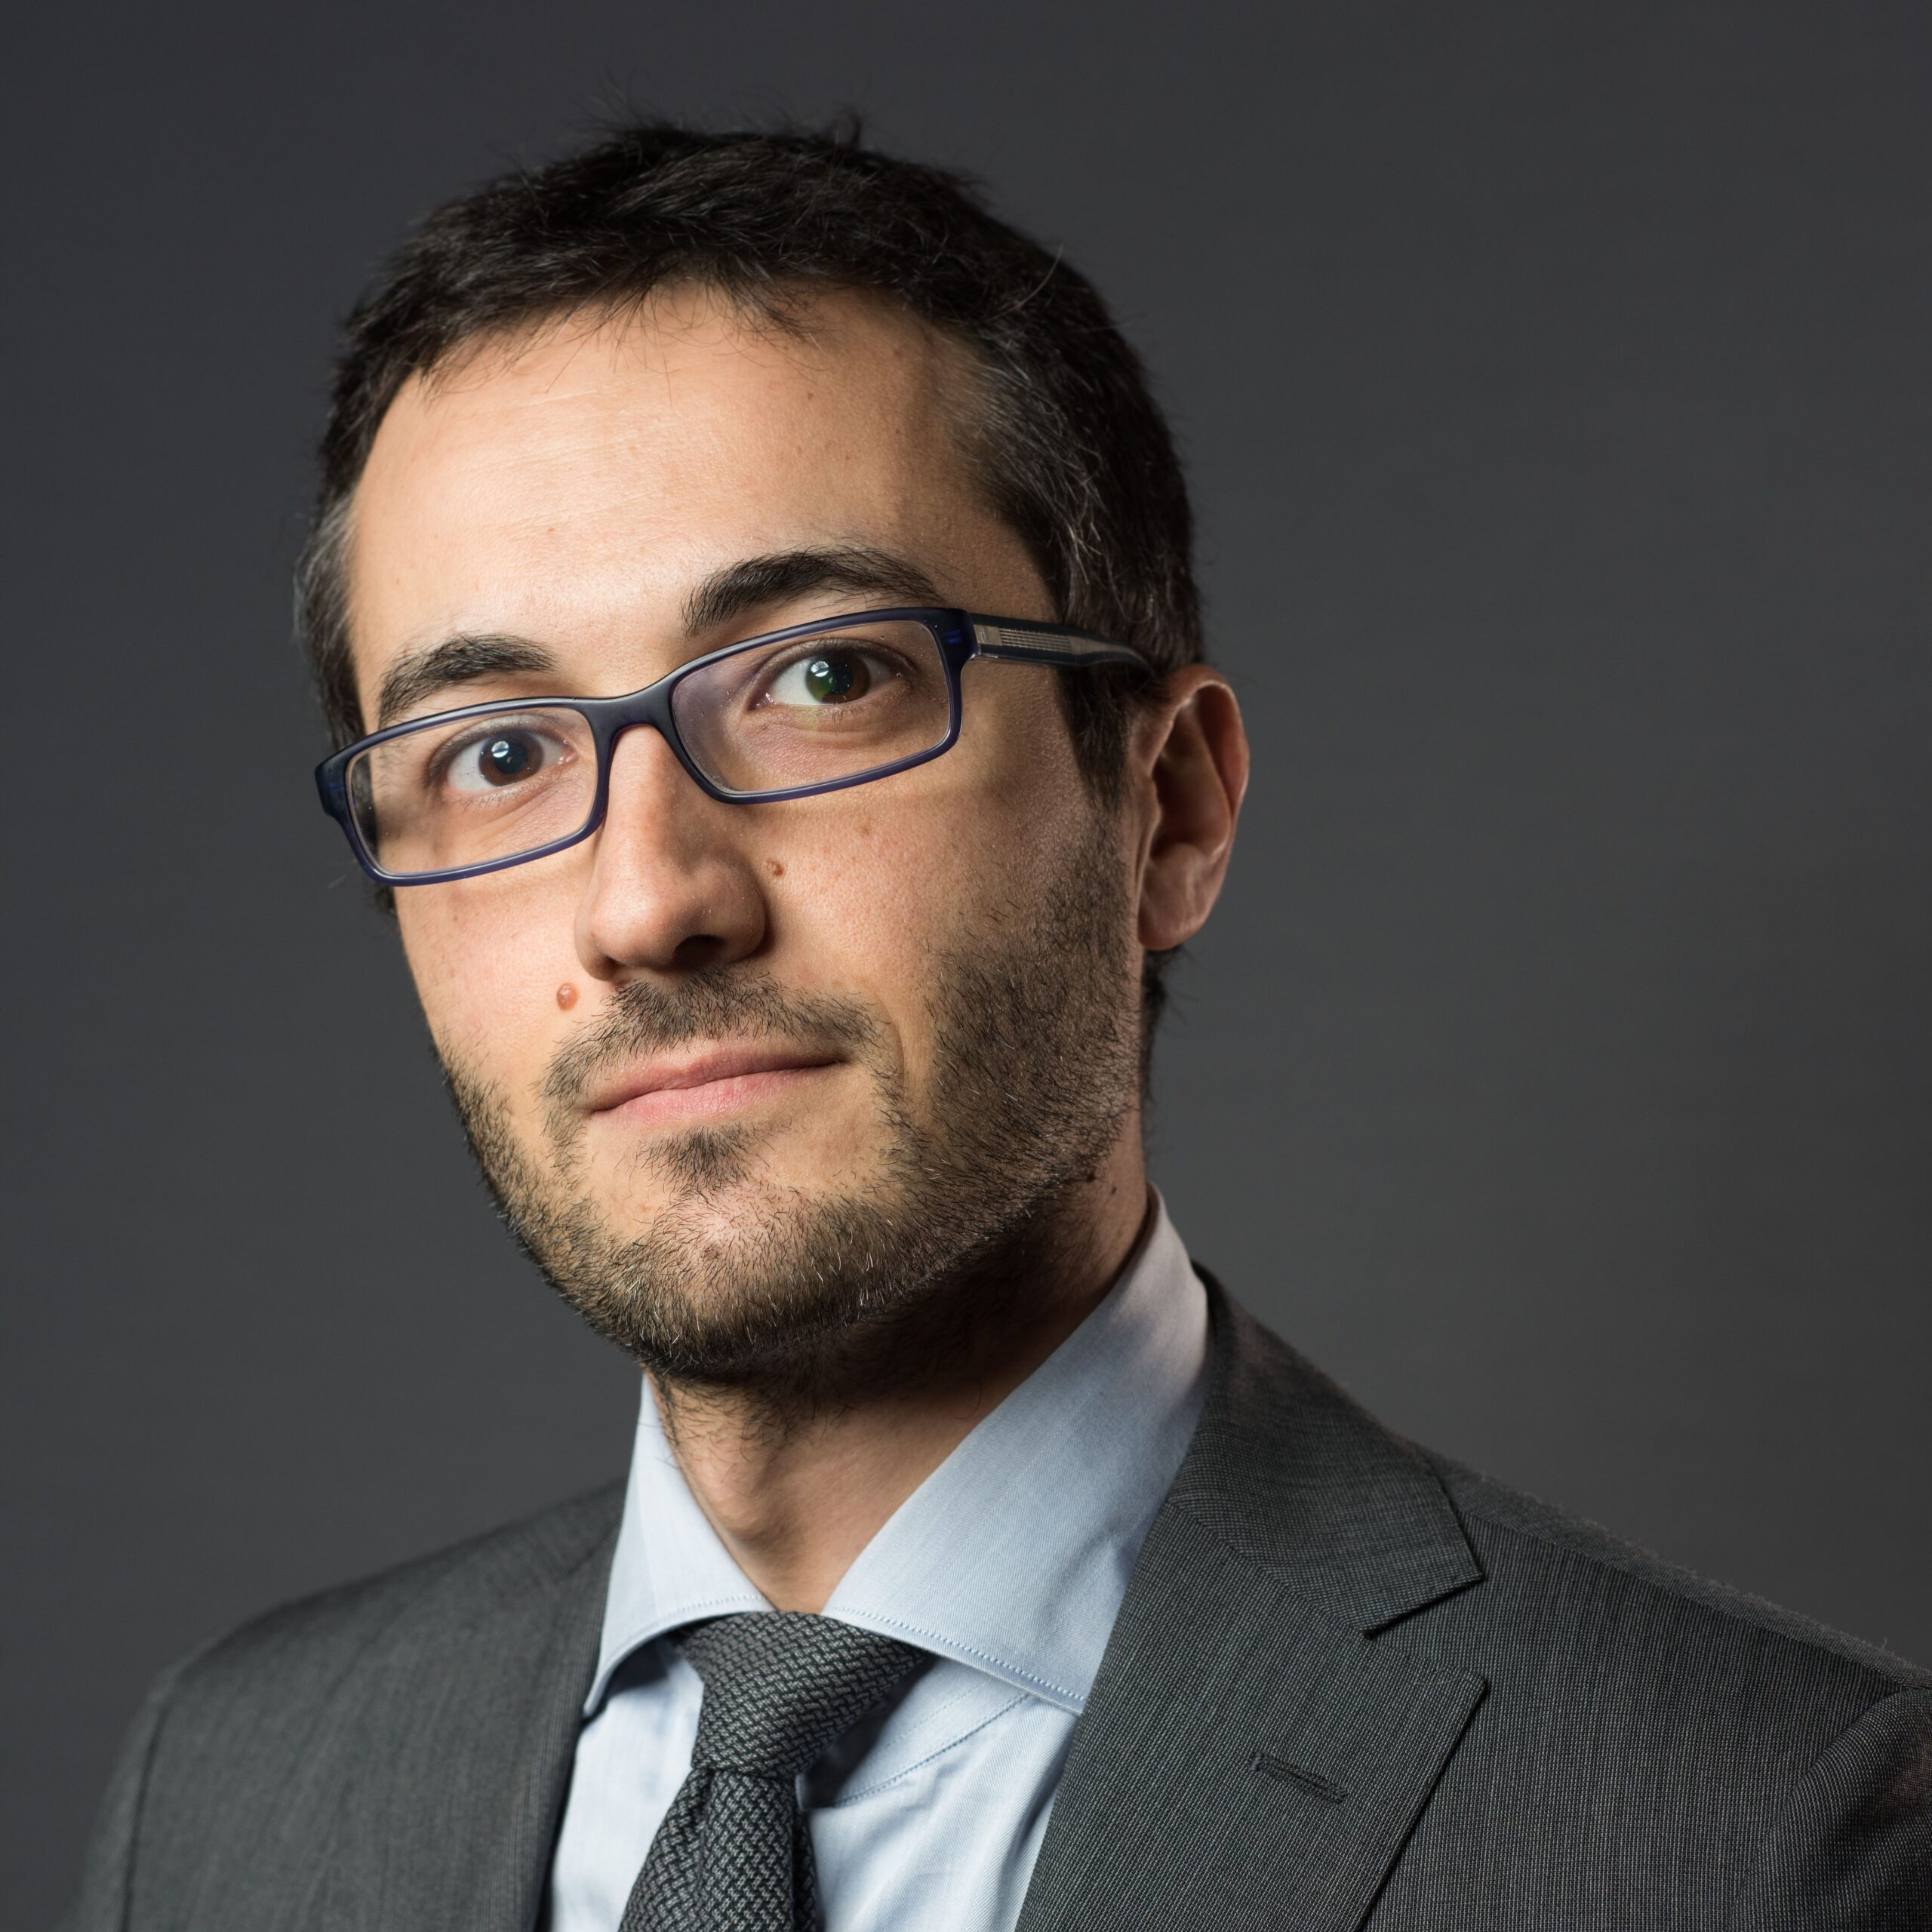 Roberto Iannone